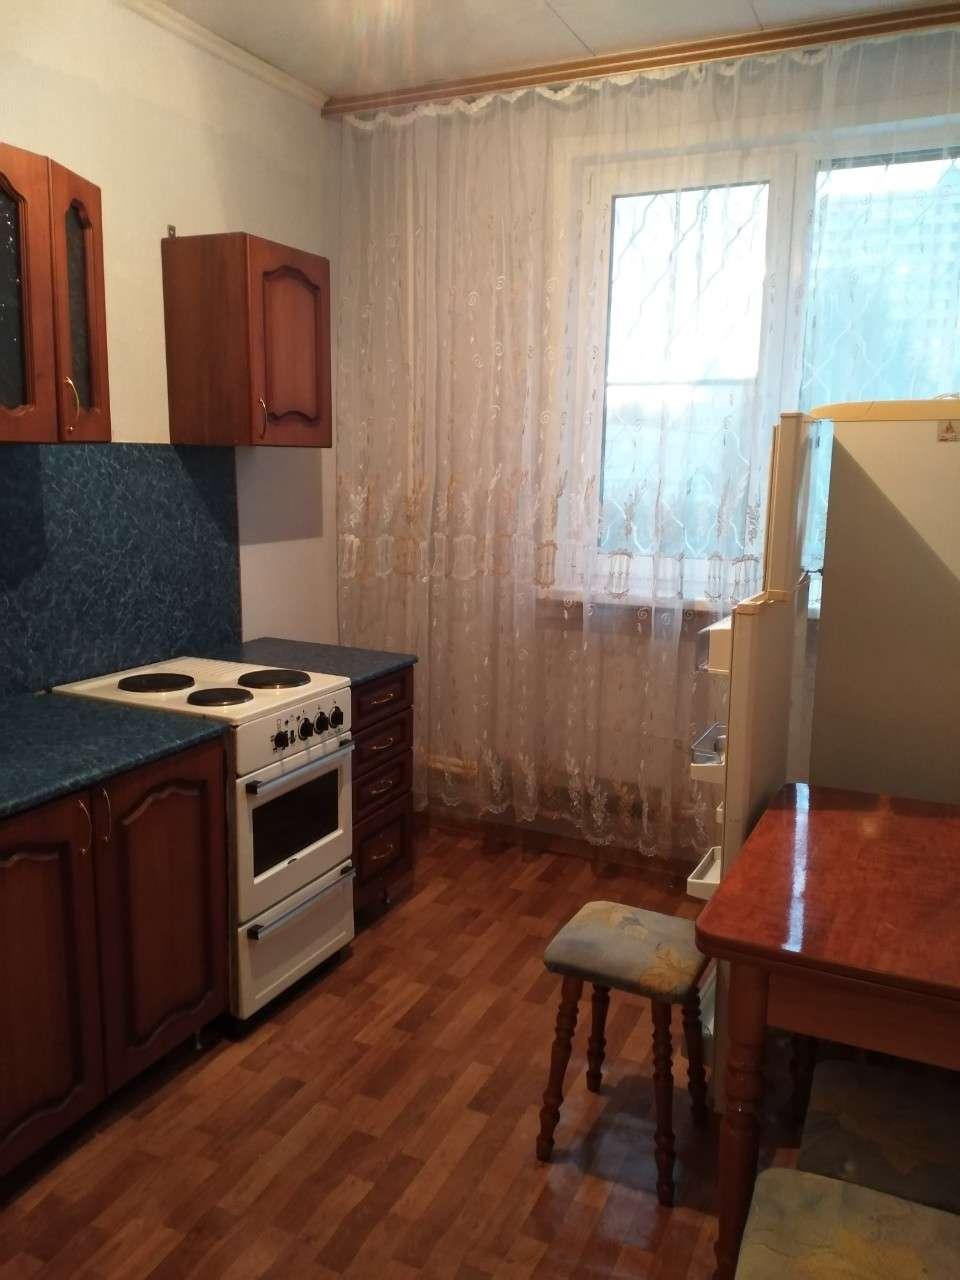 Аренда 1-комнатной квартиры, г. Тольятти, Степана Разина проспект  дом 66